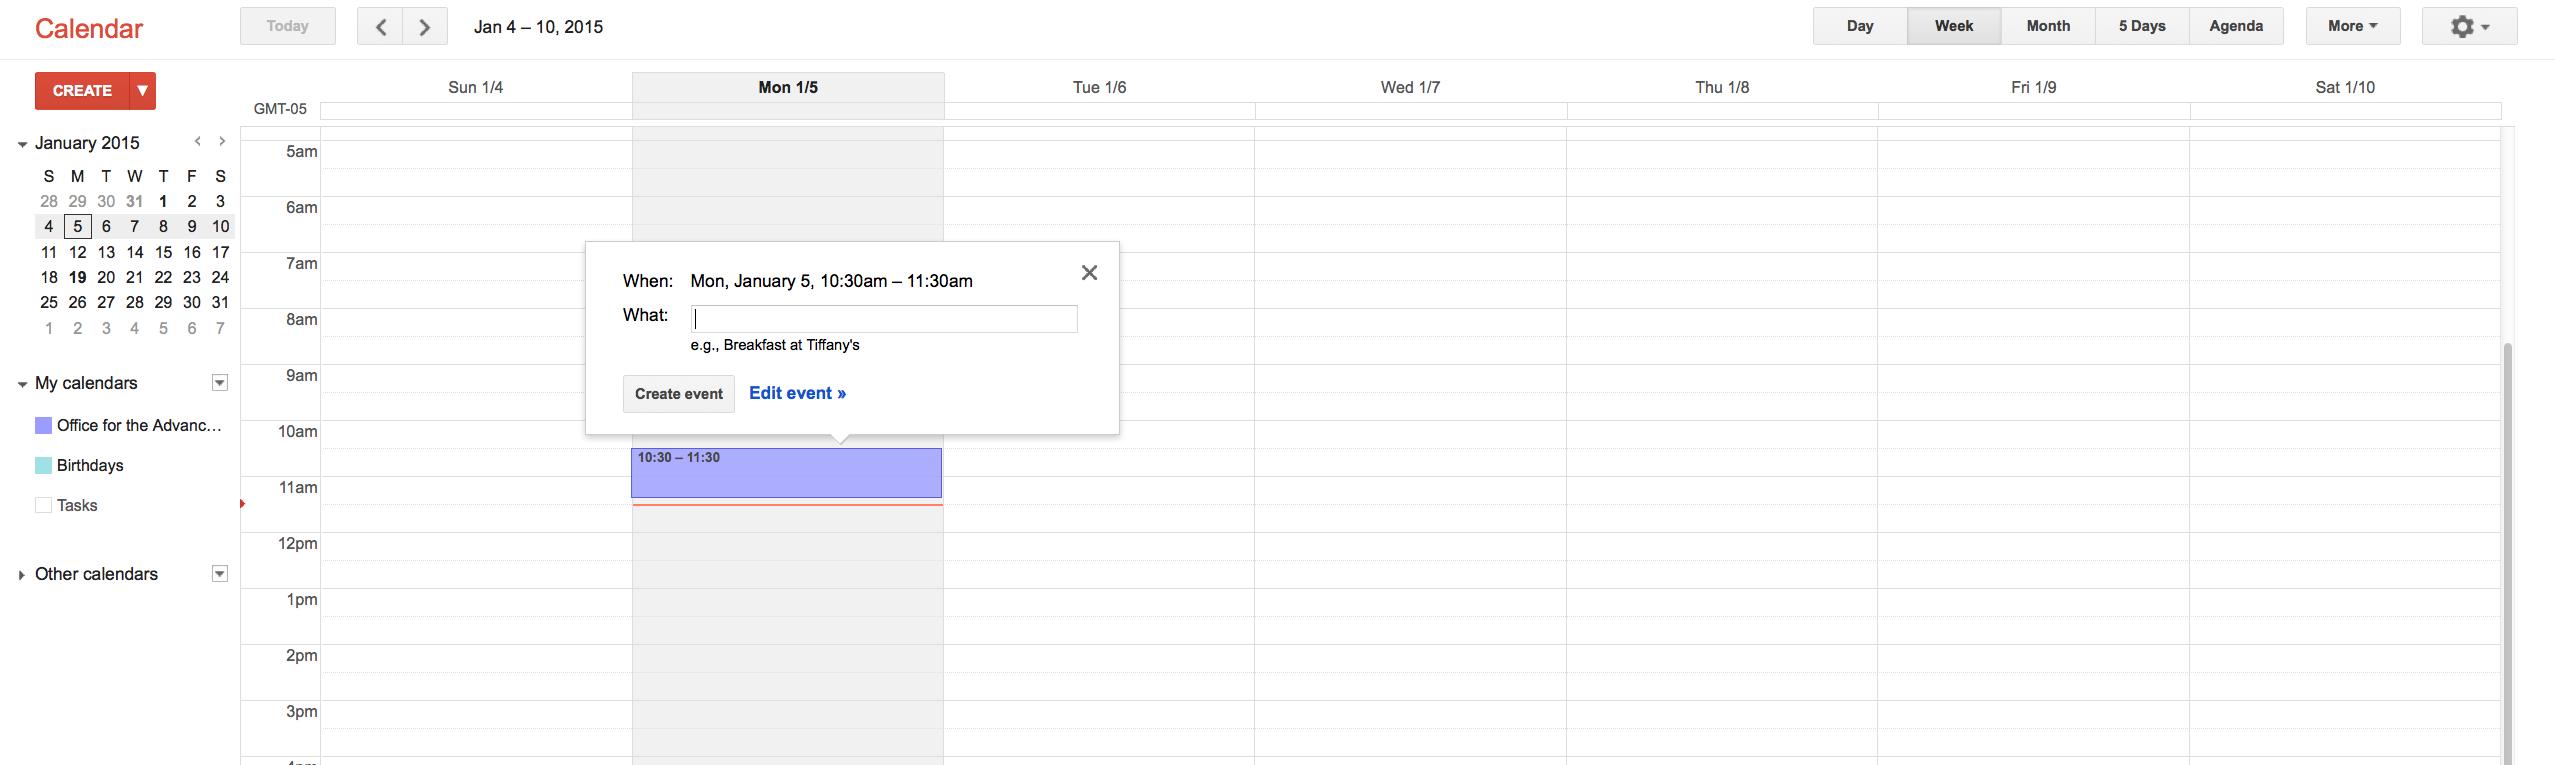 Keeping Track Of Important Dates Using Google Calendar Inside Uri Calendar Academic